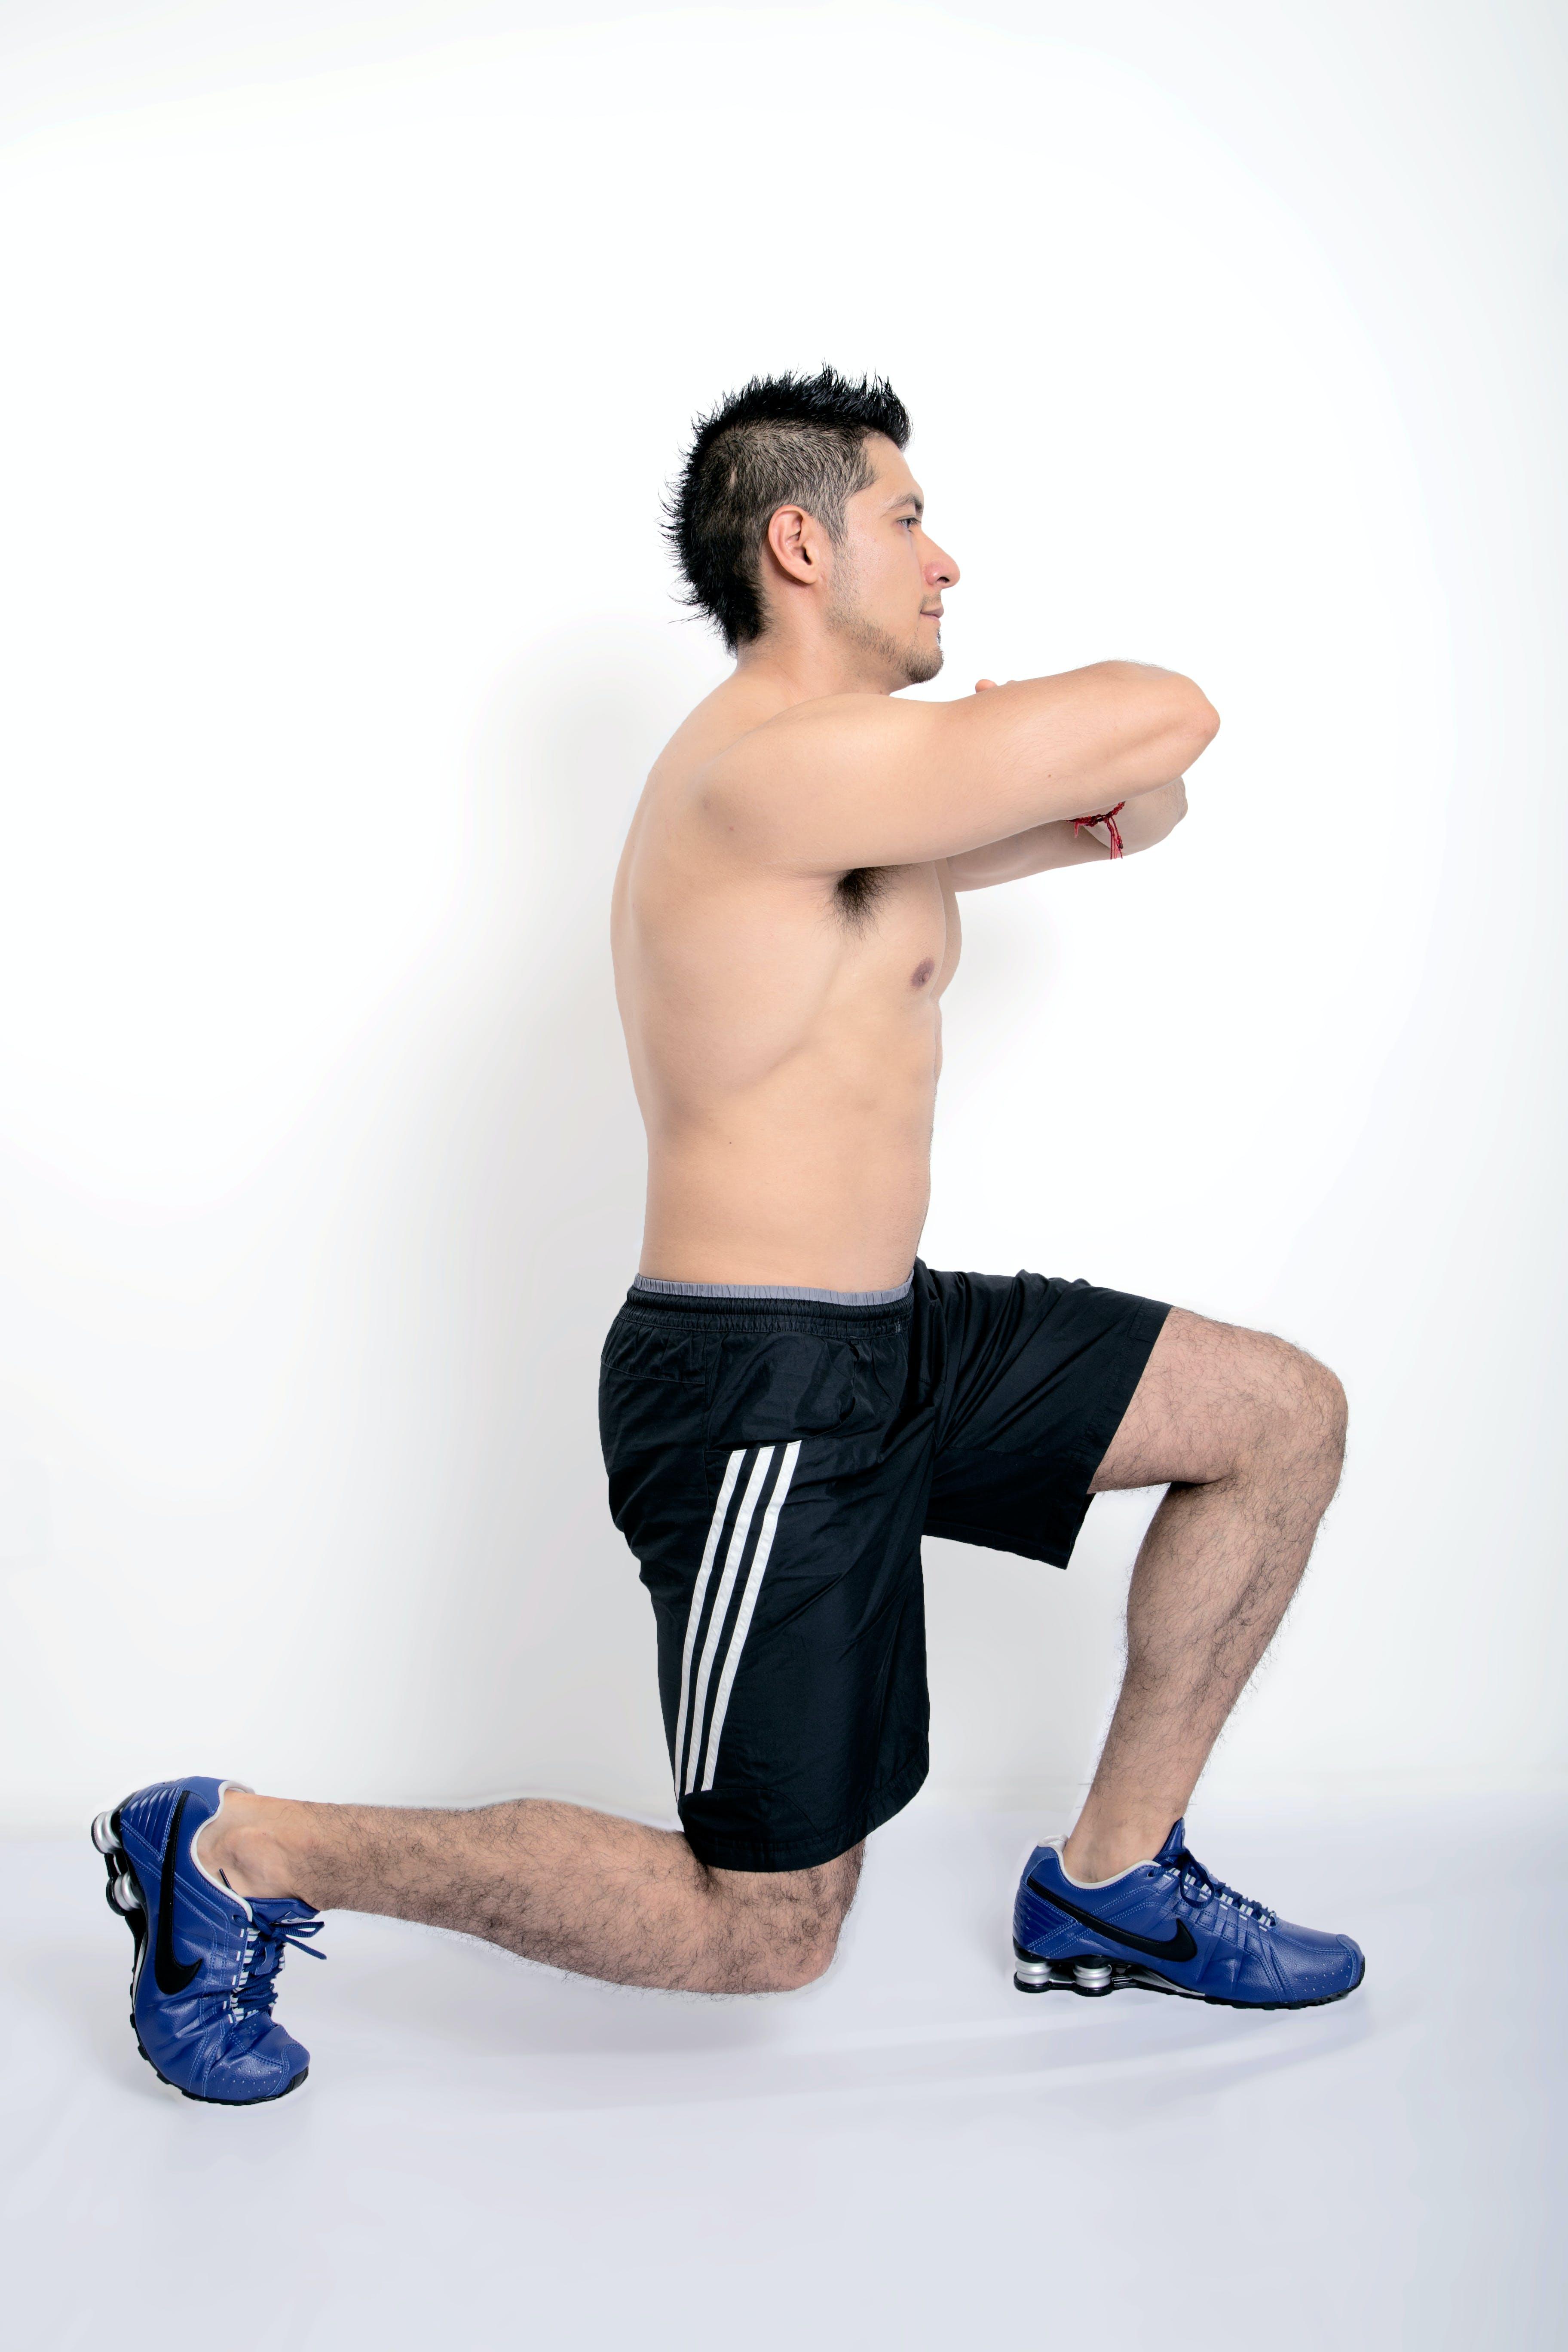 Free stock photo of fitness, model, sports, sportswear